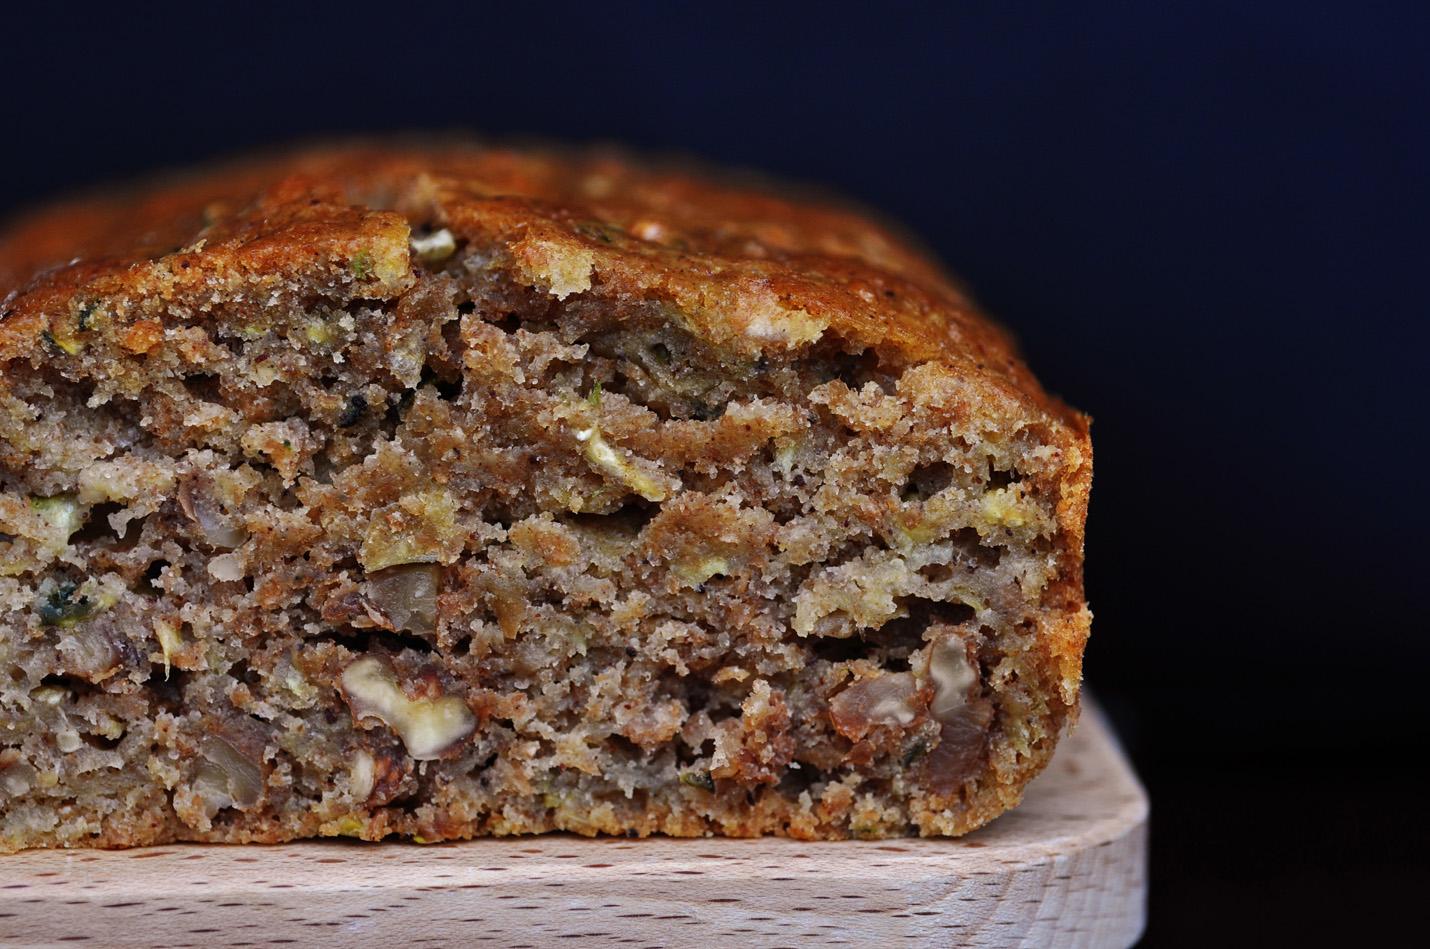 Recipes for zucchini cake with walnut